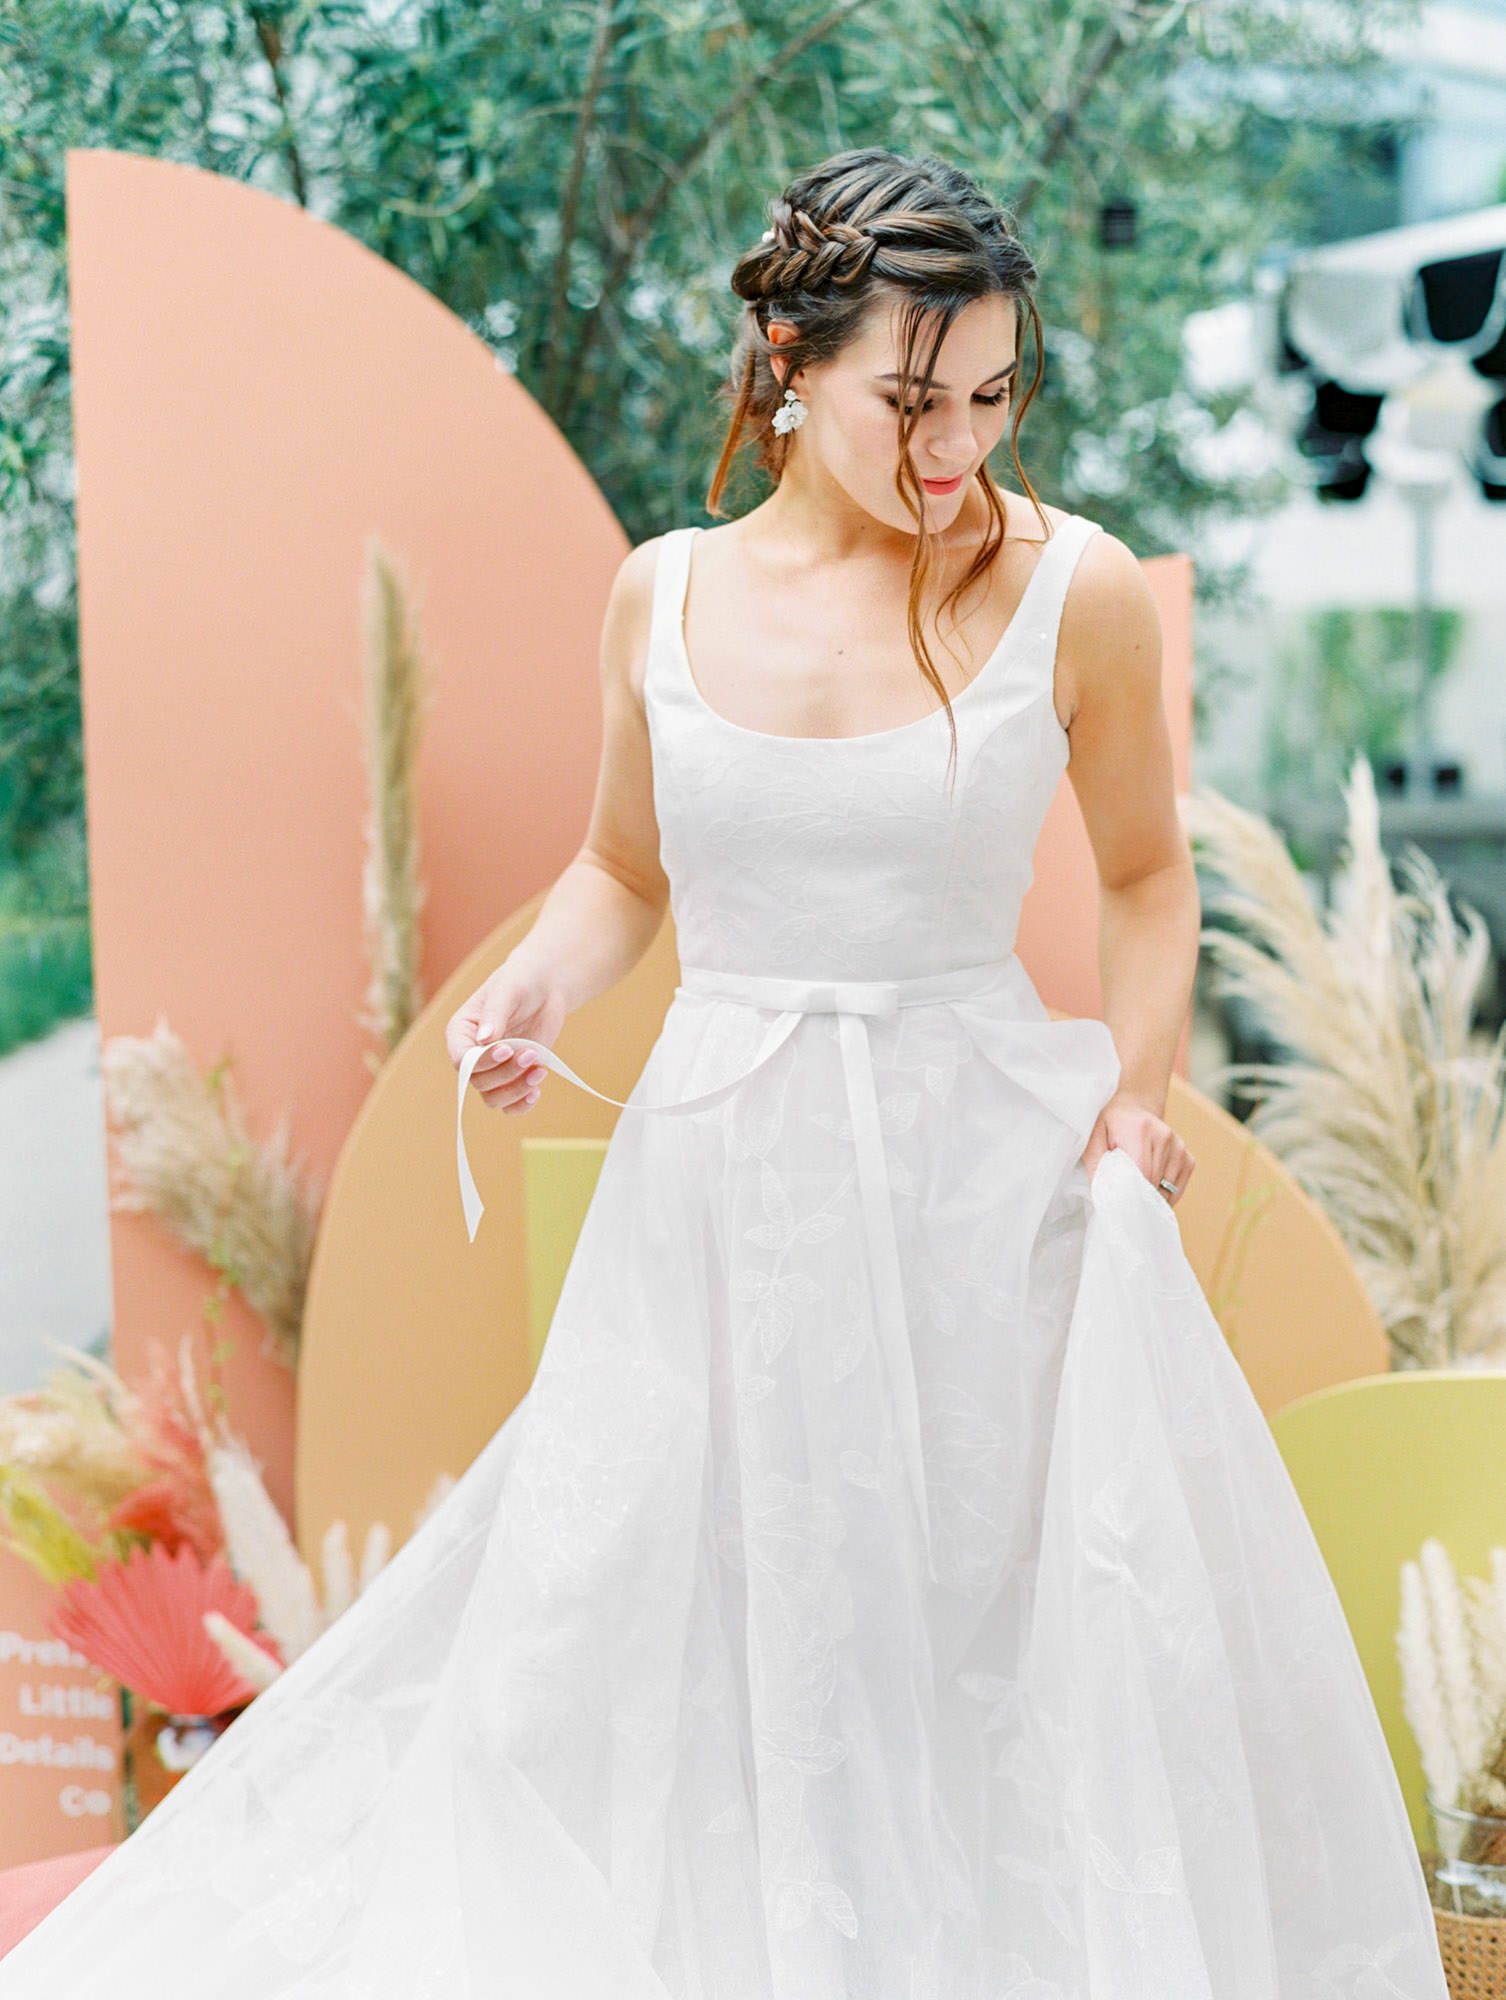 Sleeveless scoop neck with ivory ribbon around waist and floral pattern on skirt. Bea Marchesa Notte wedding dress in San Diego by Cavin Elizabeth - San Diego film photographer. Wedding Fashion Inspiration.